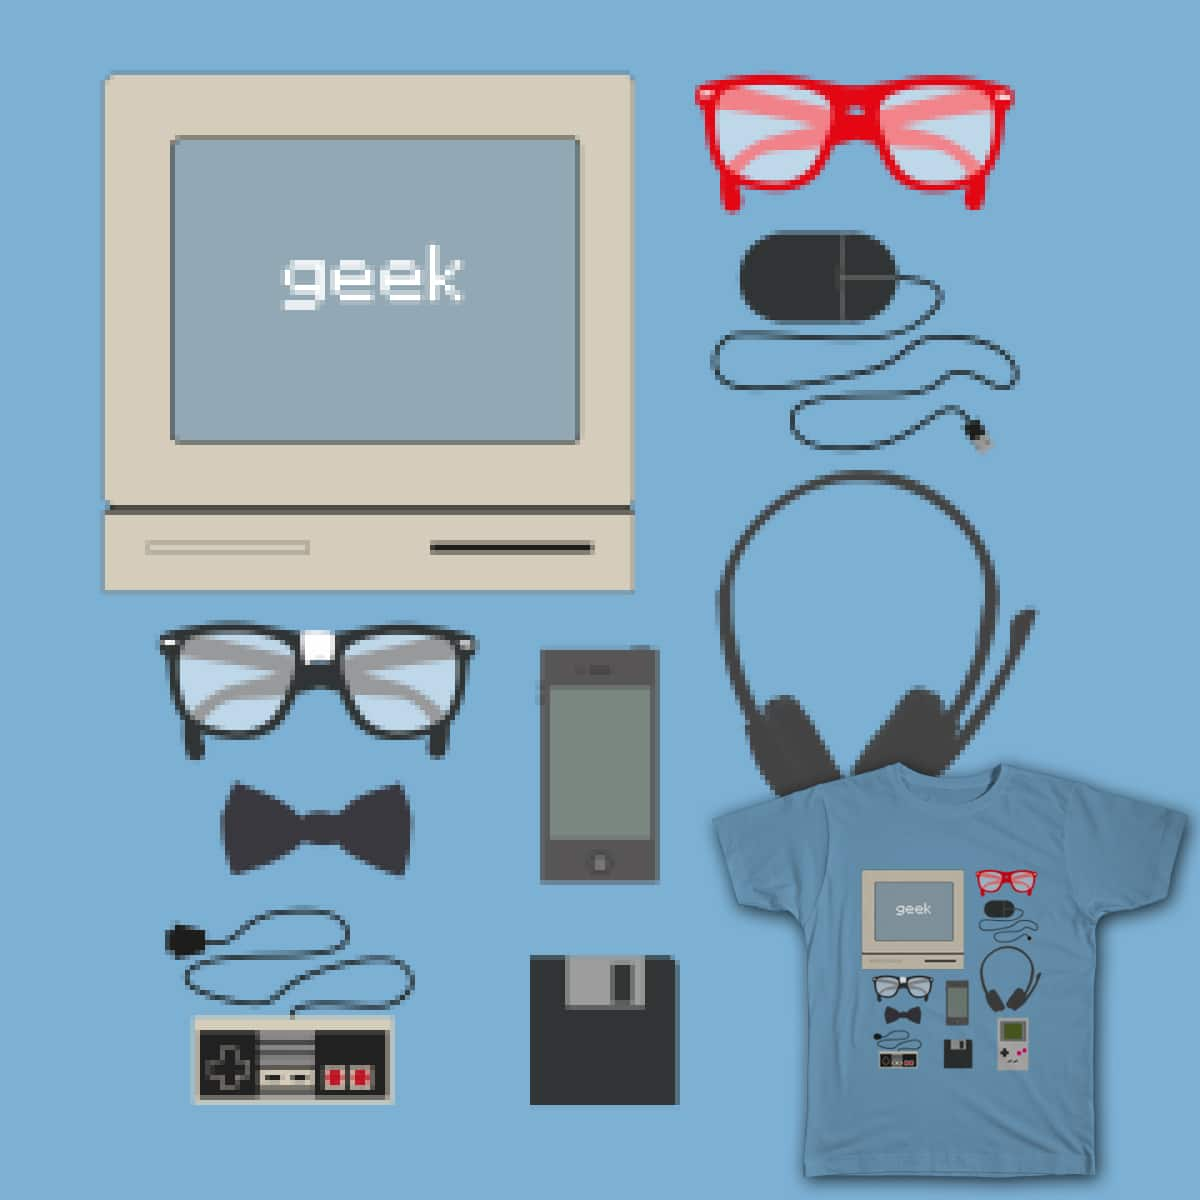 Geek Retro by ammooina on Threadless